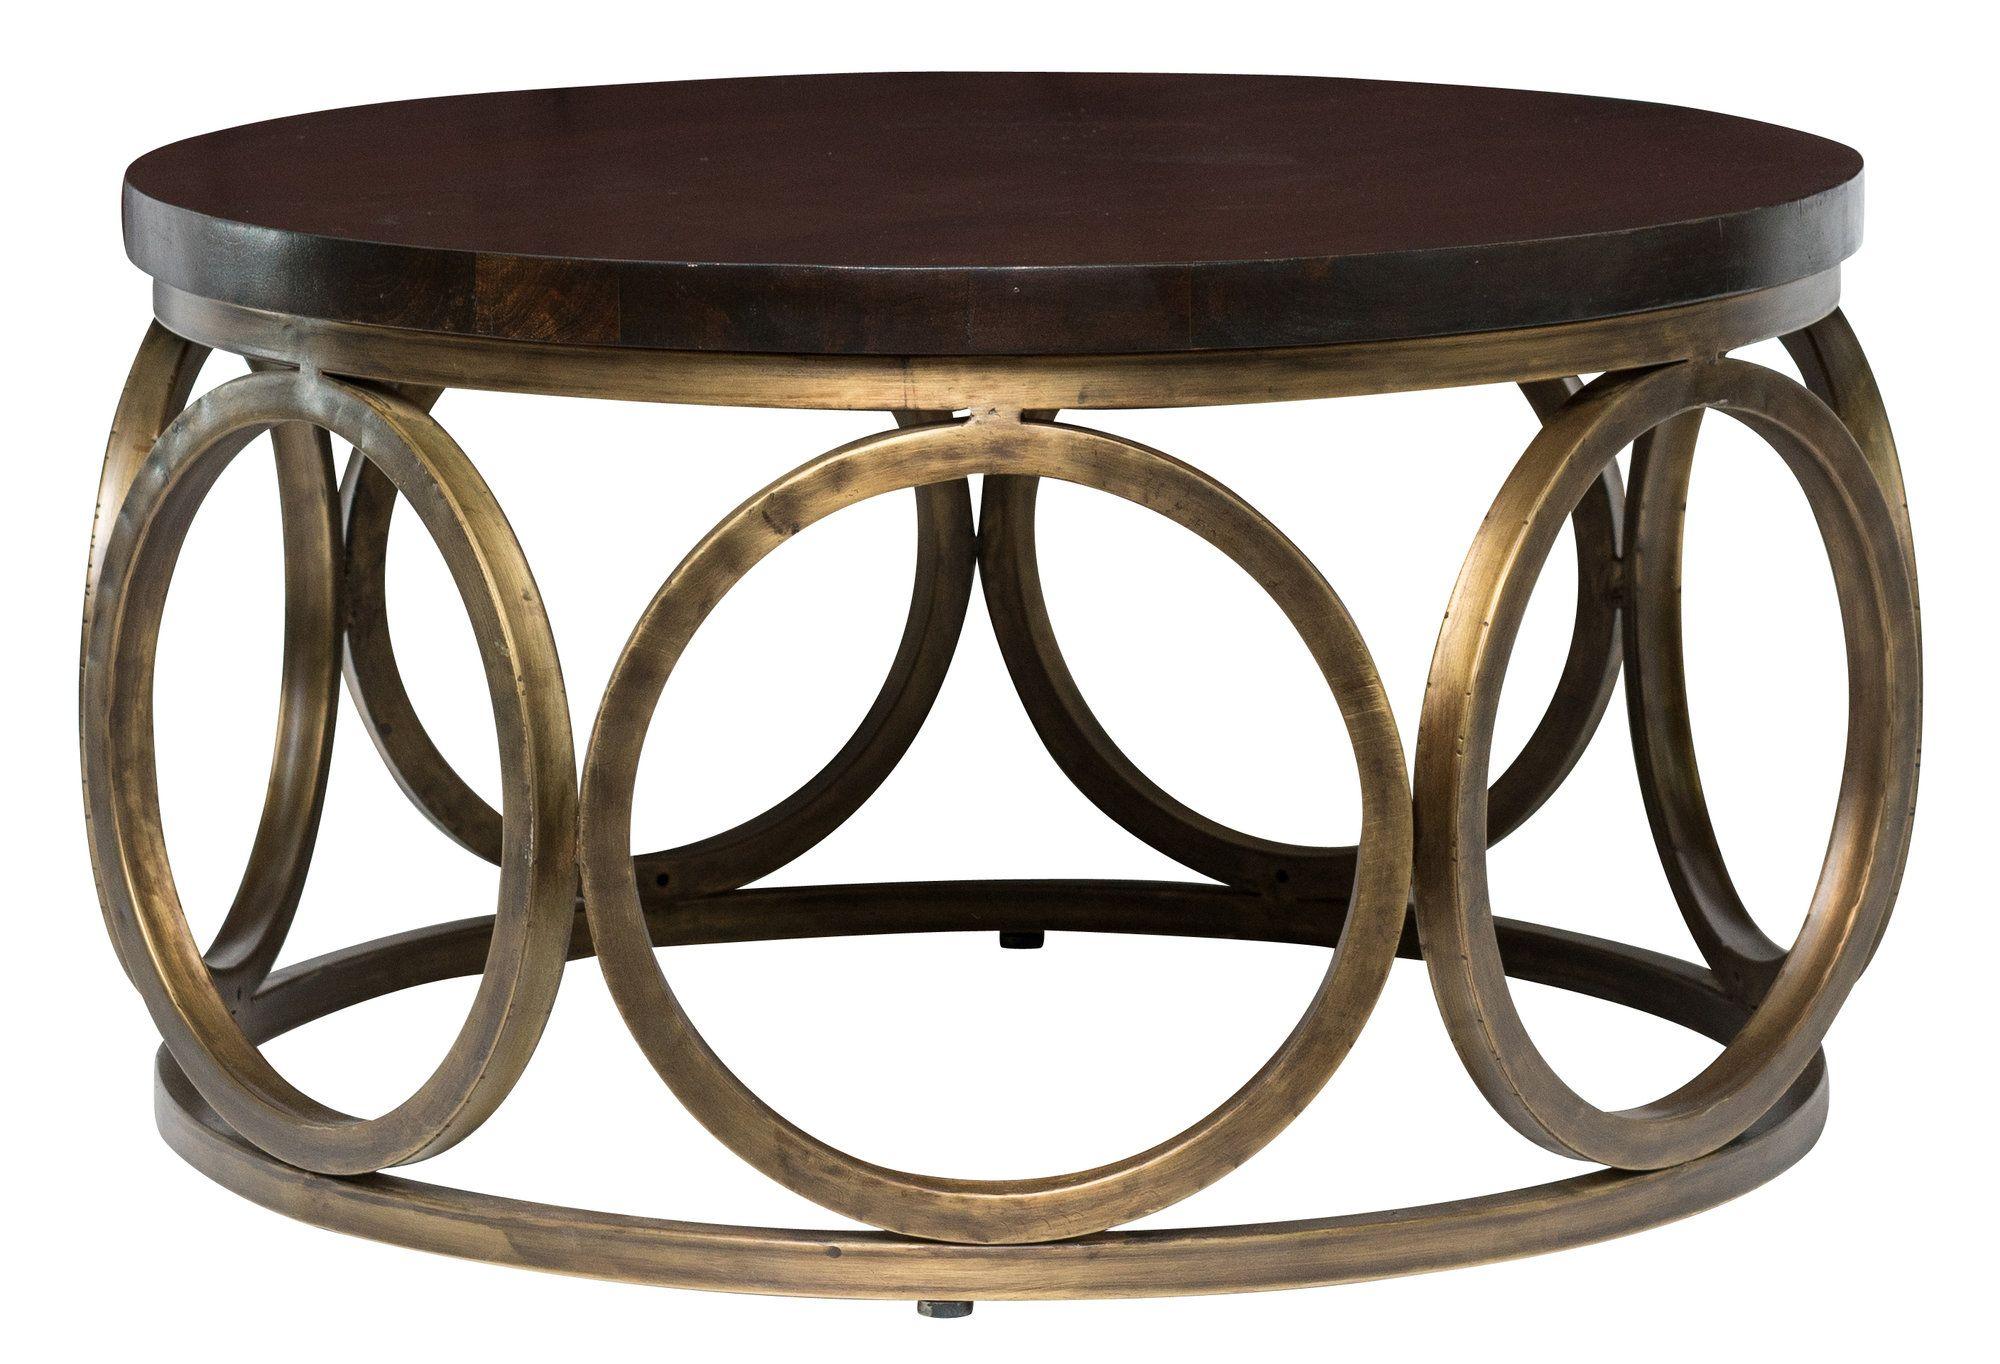 Farrah Coffee Table Mango Wood Coffee Table Round Wood Coffee Table Coffee Table Wood [ 1364 x 2000 Pixel ]